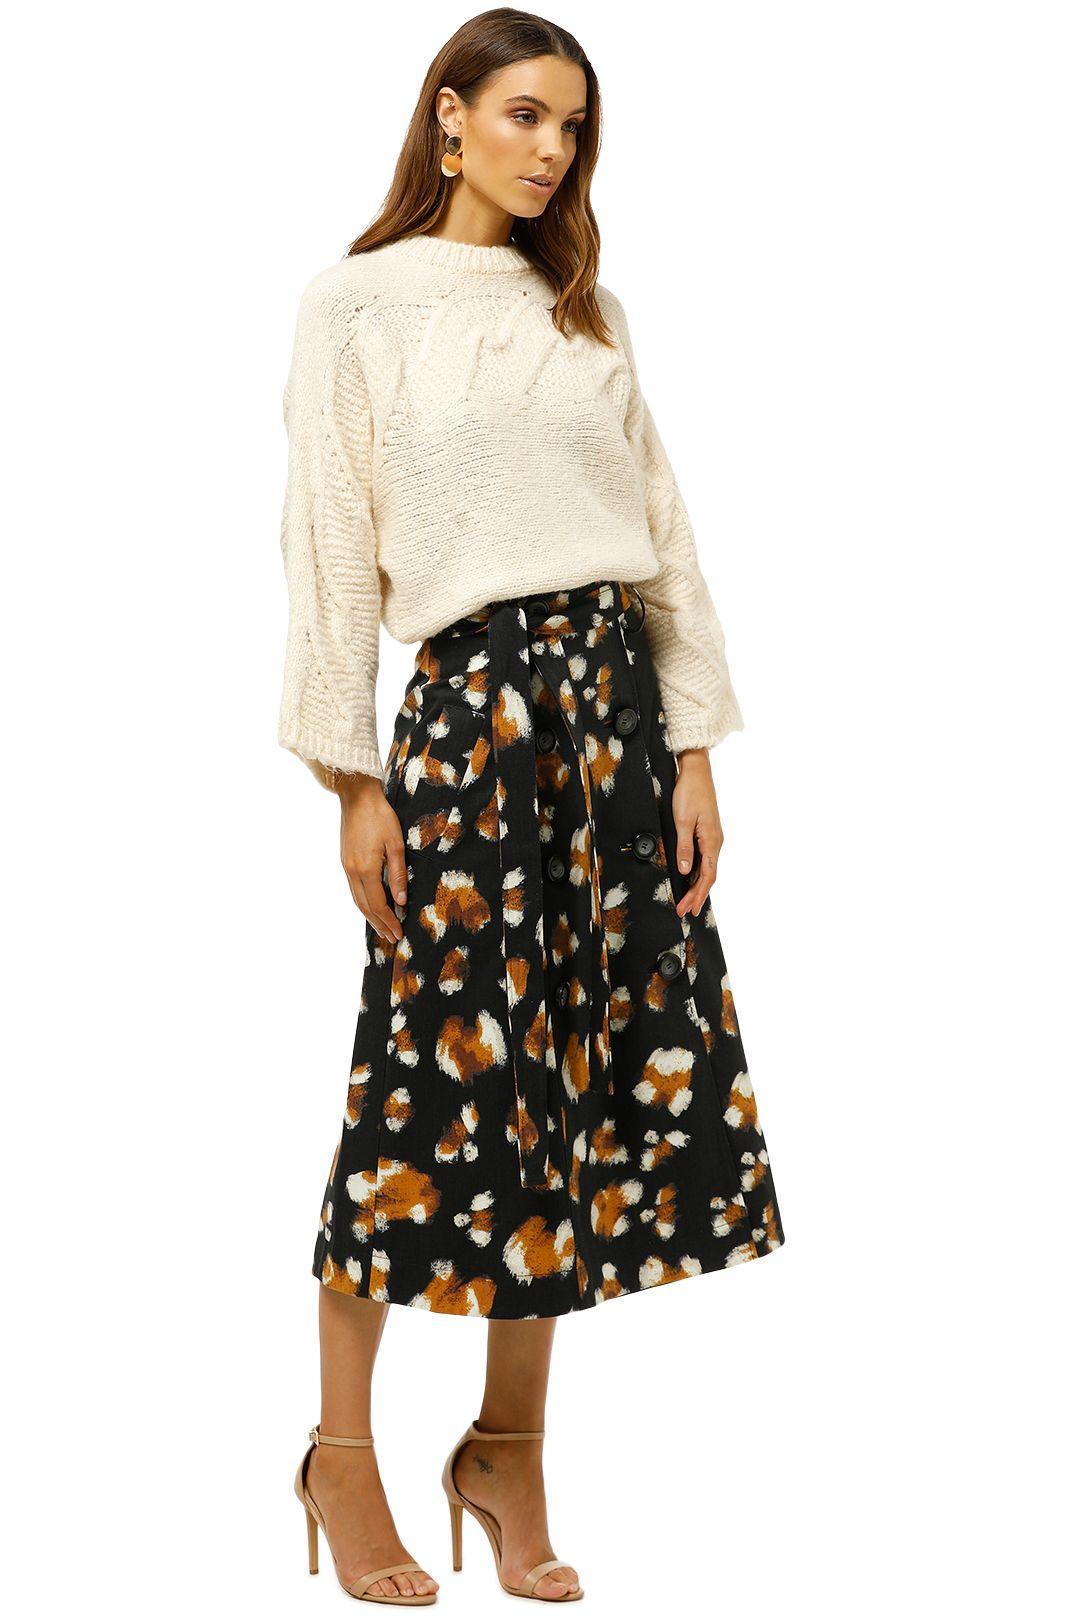 MNG-Contrasting-Knit-Sweater-Ecru-Side